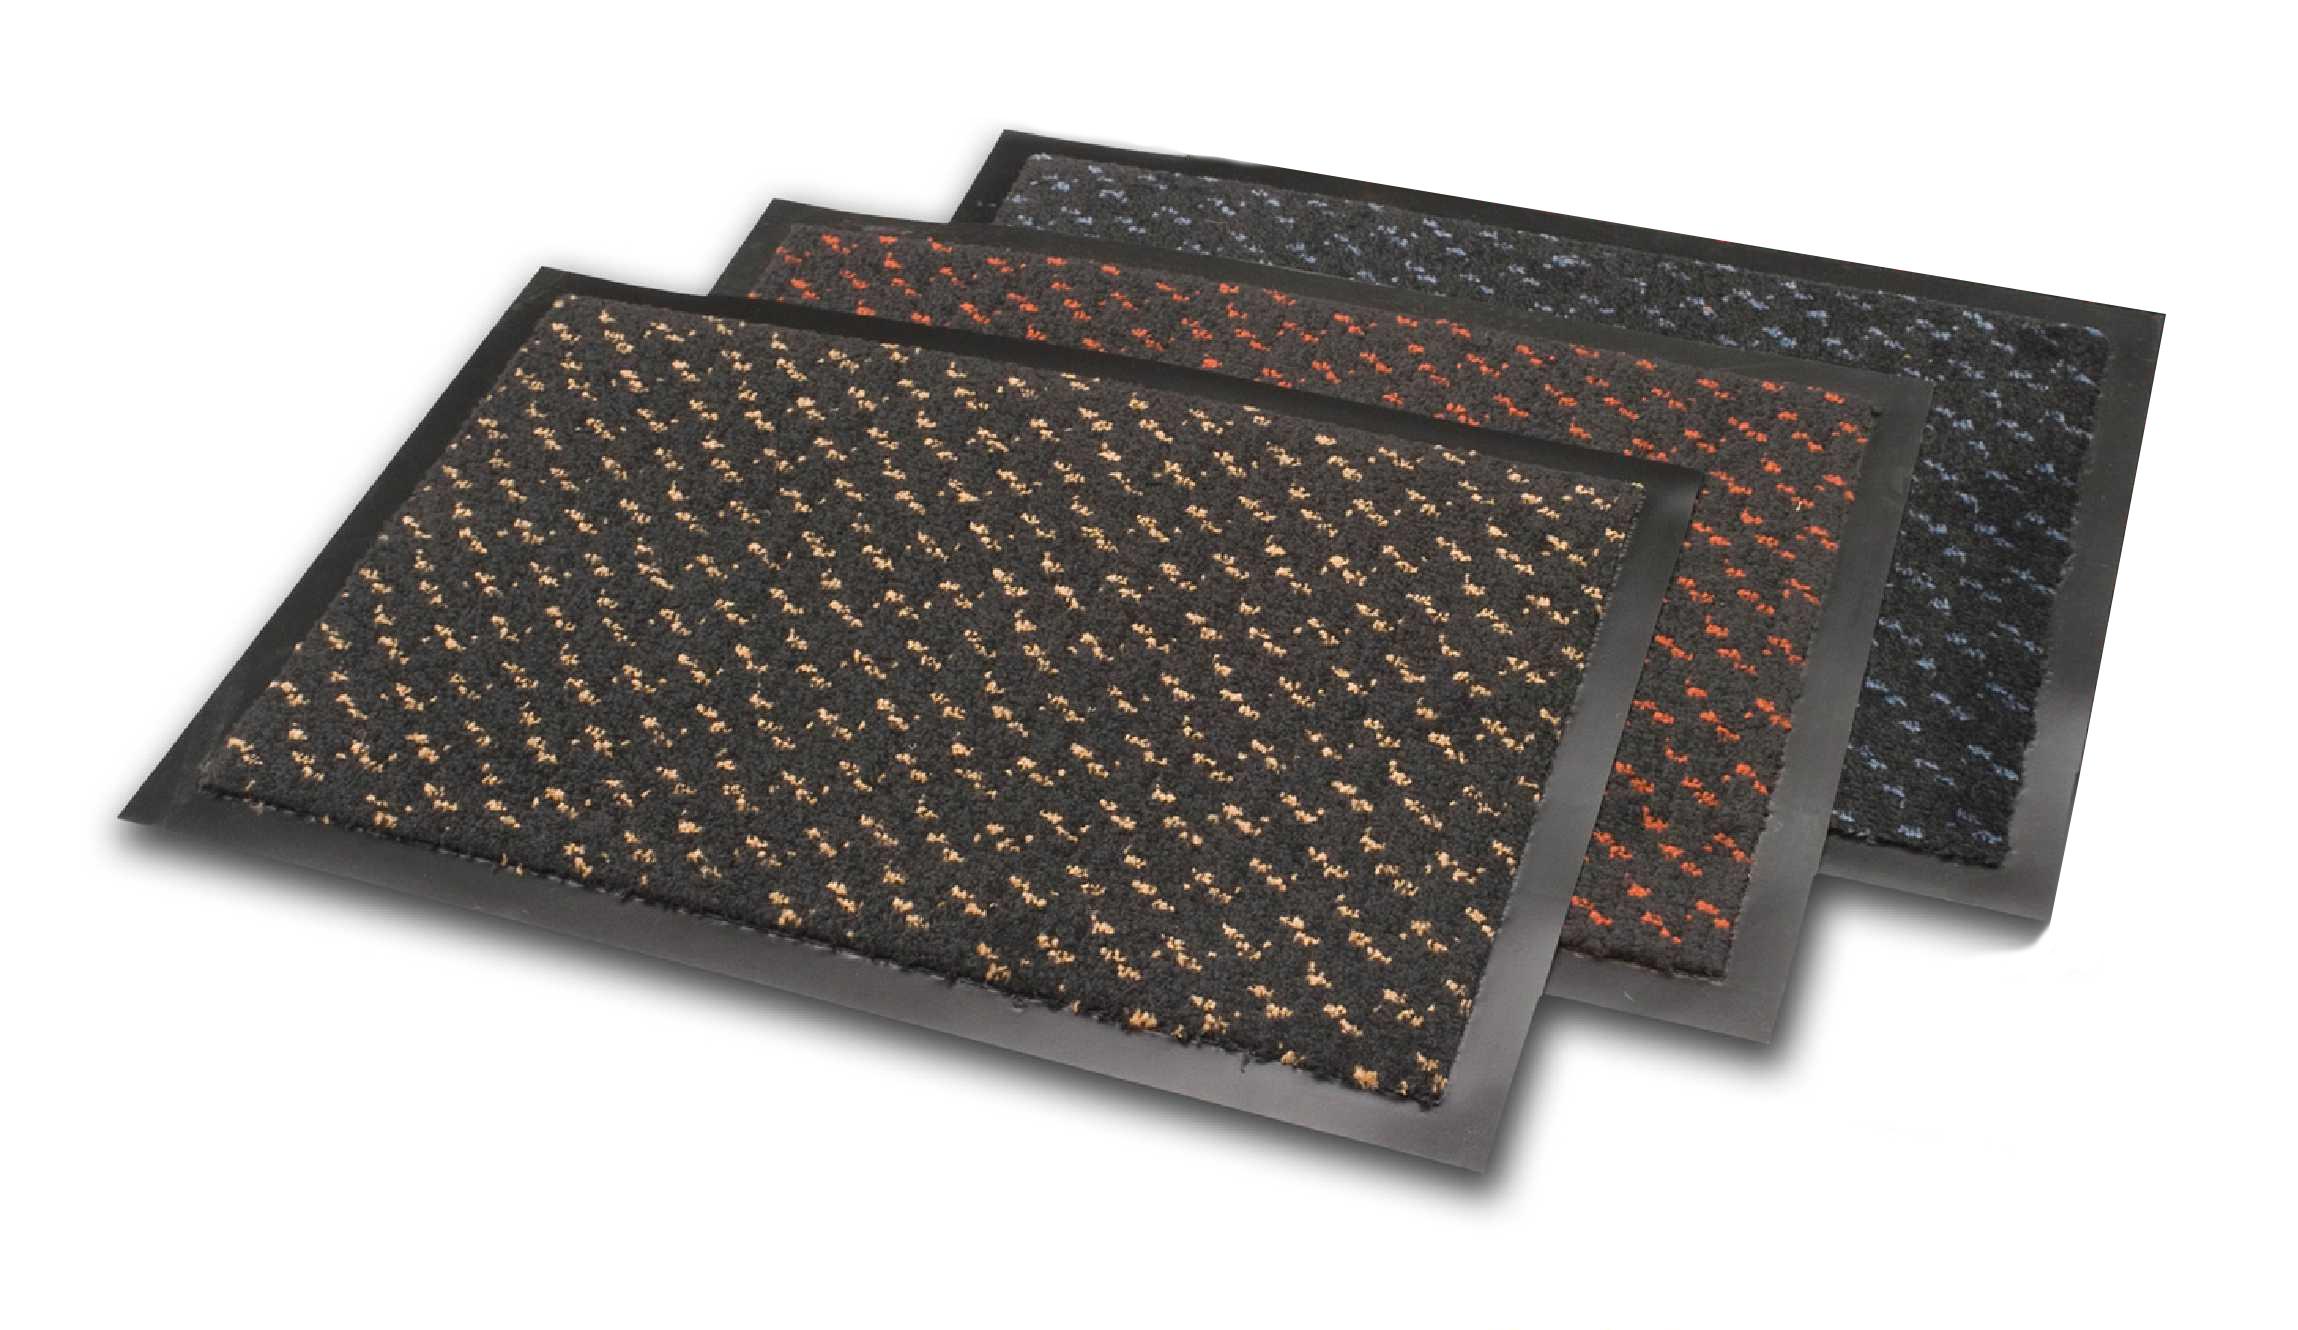 Floor mats shop - Door Floor Barrier Mat Mats Cambridge Rubber Backing Home Office Shop